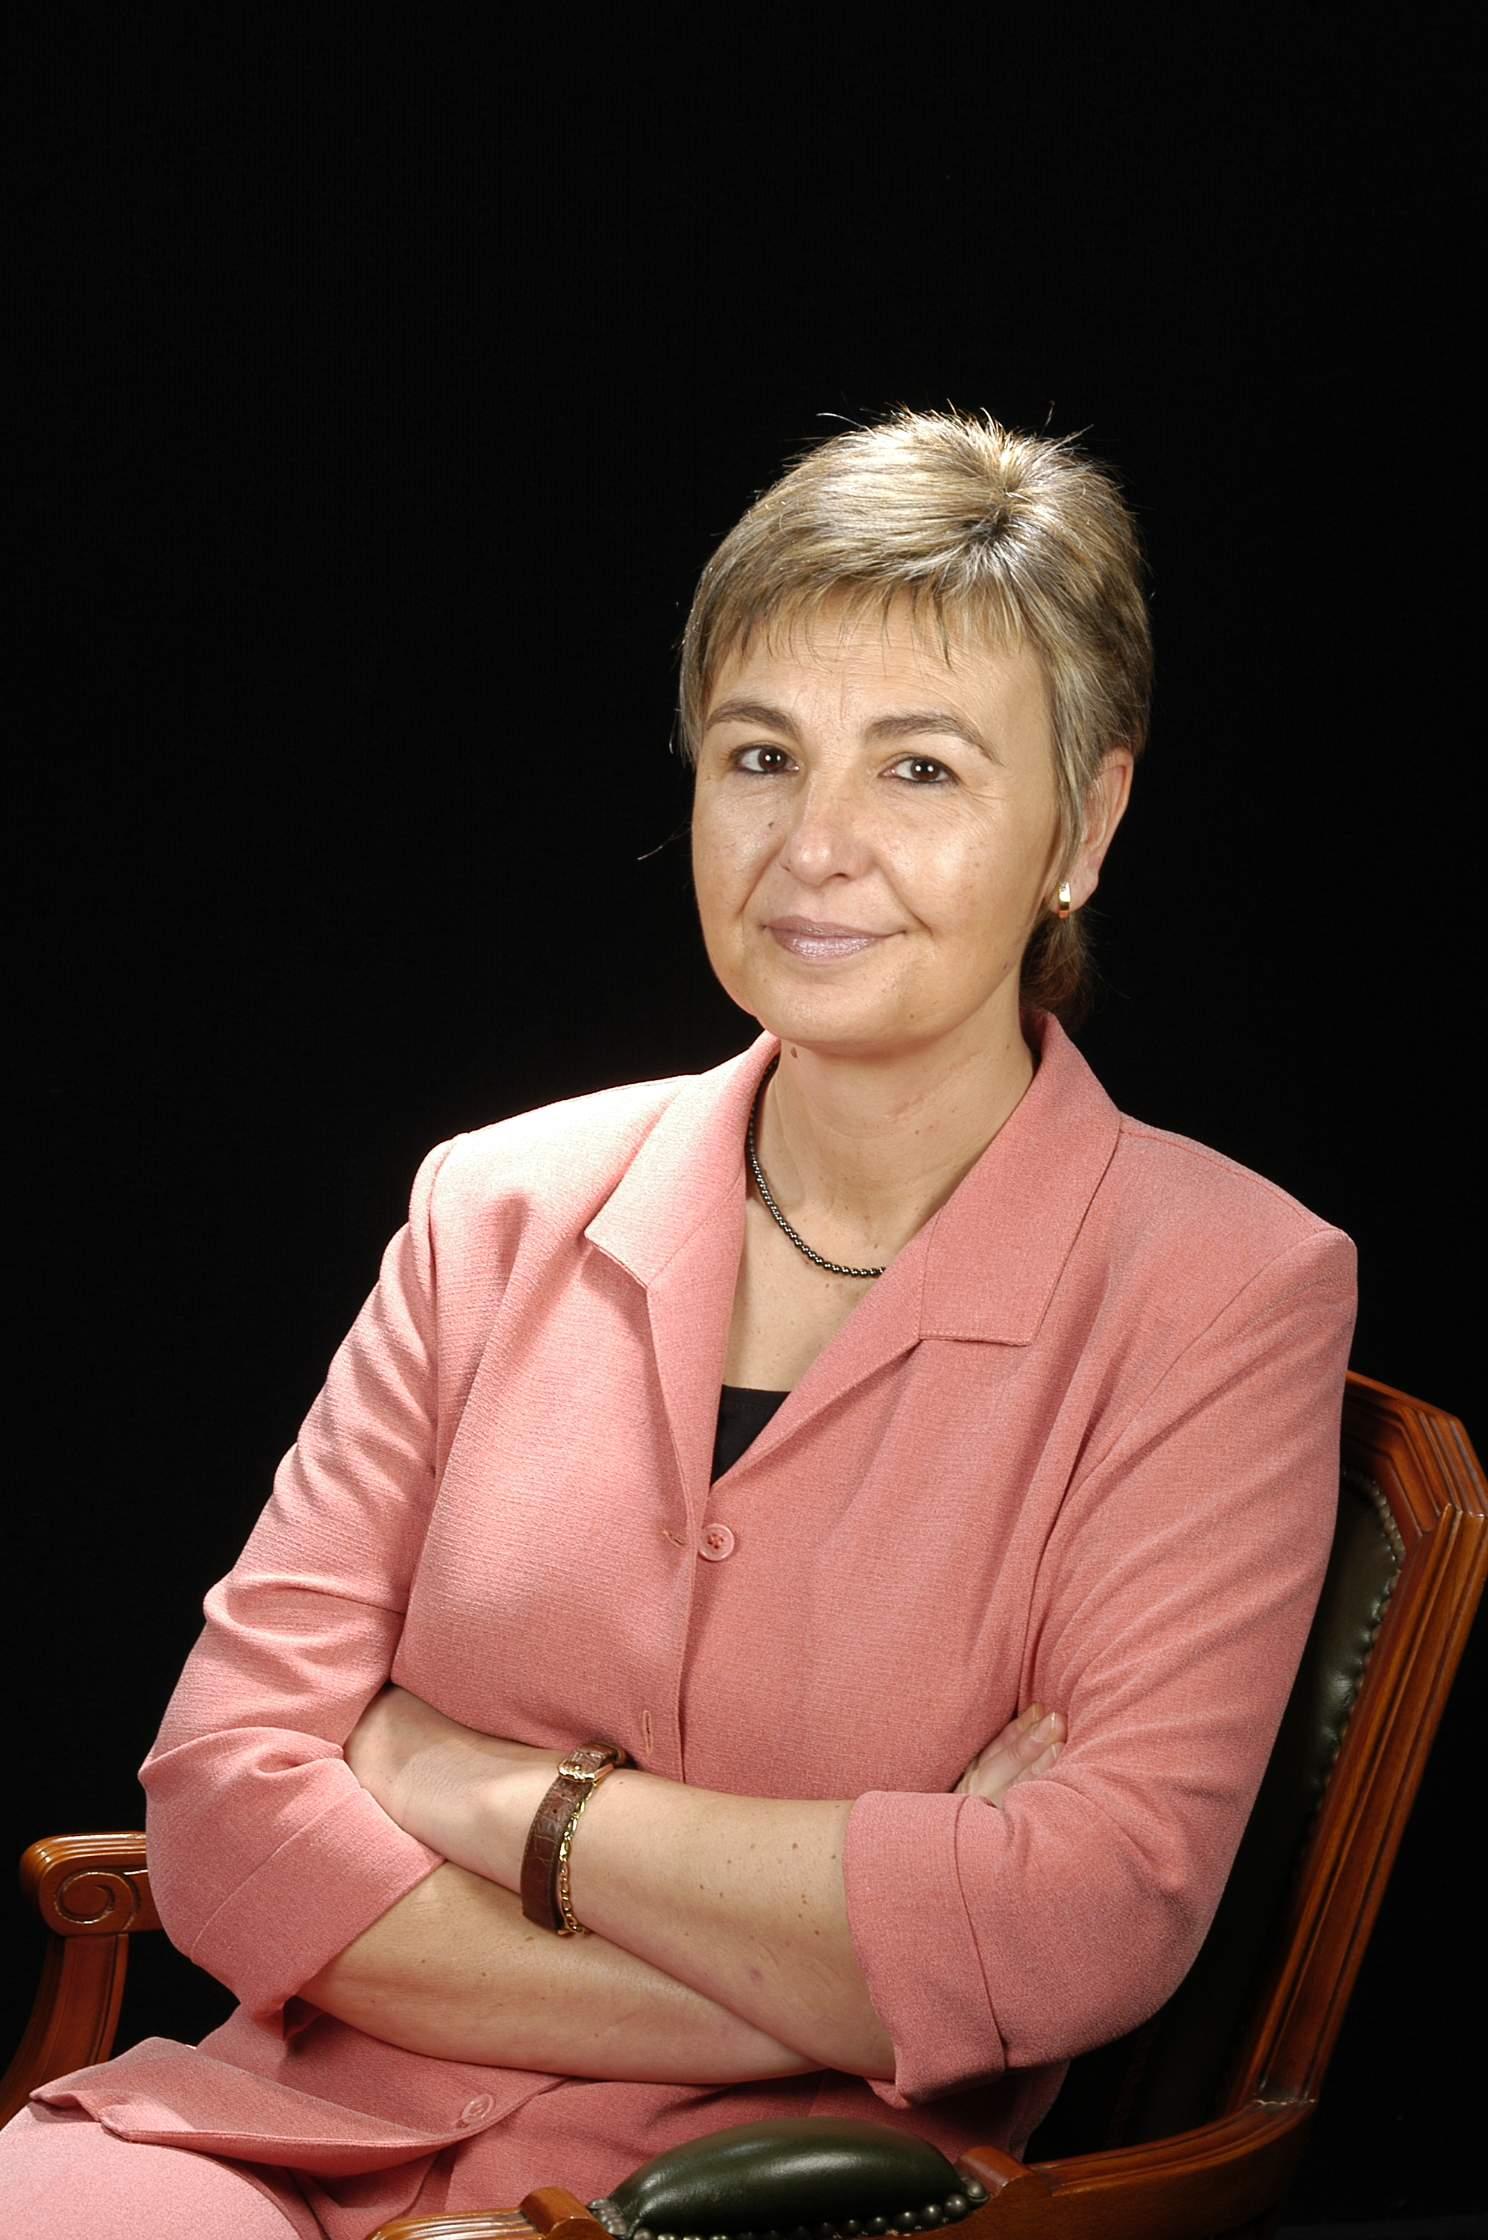 Dra. Maria Teresa Cros Miguel